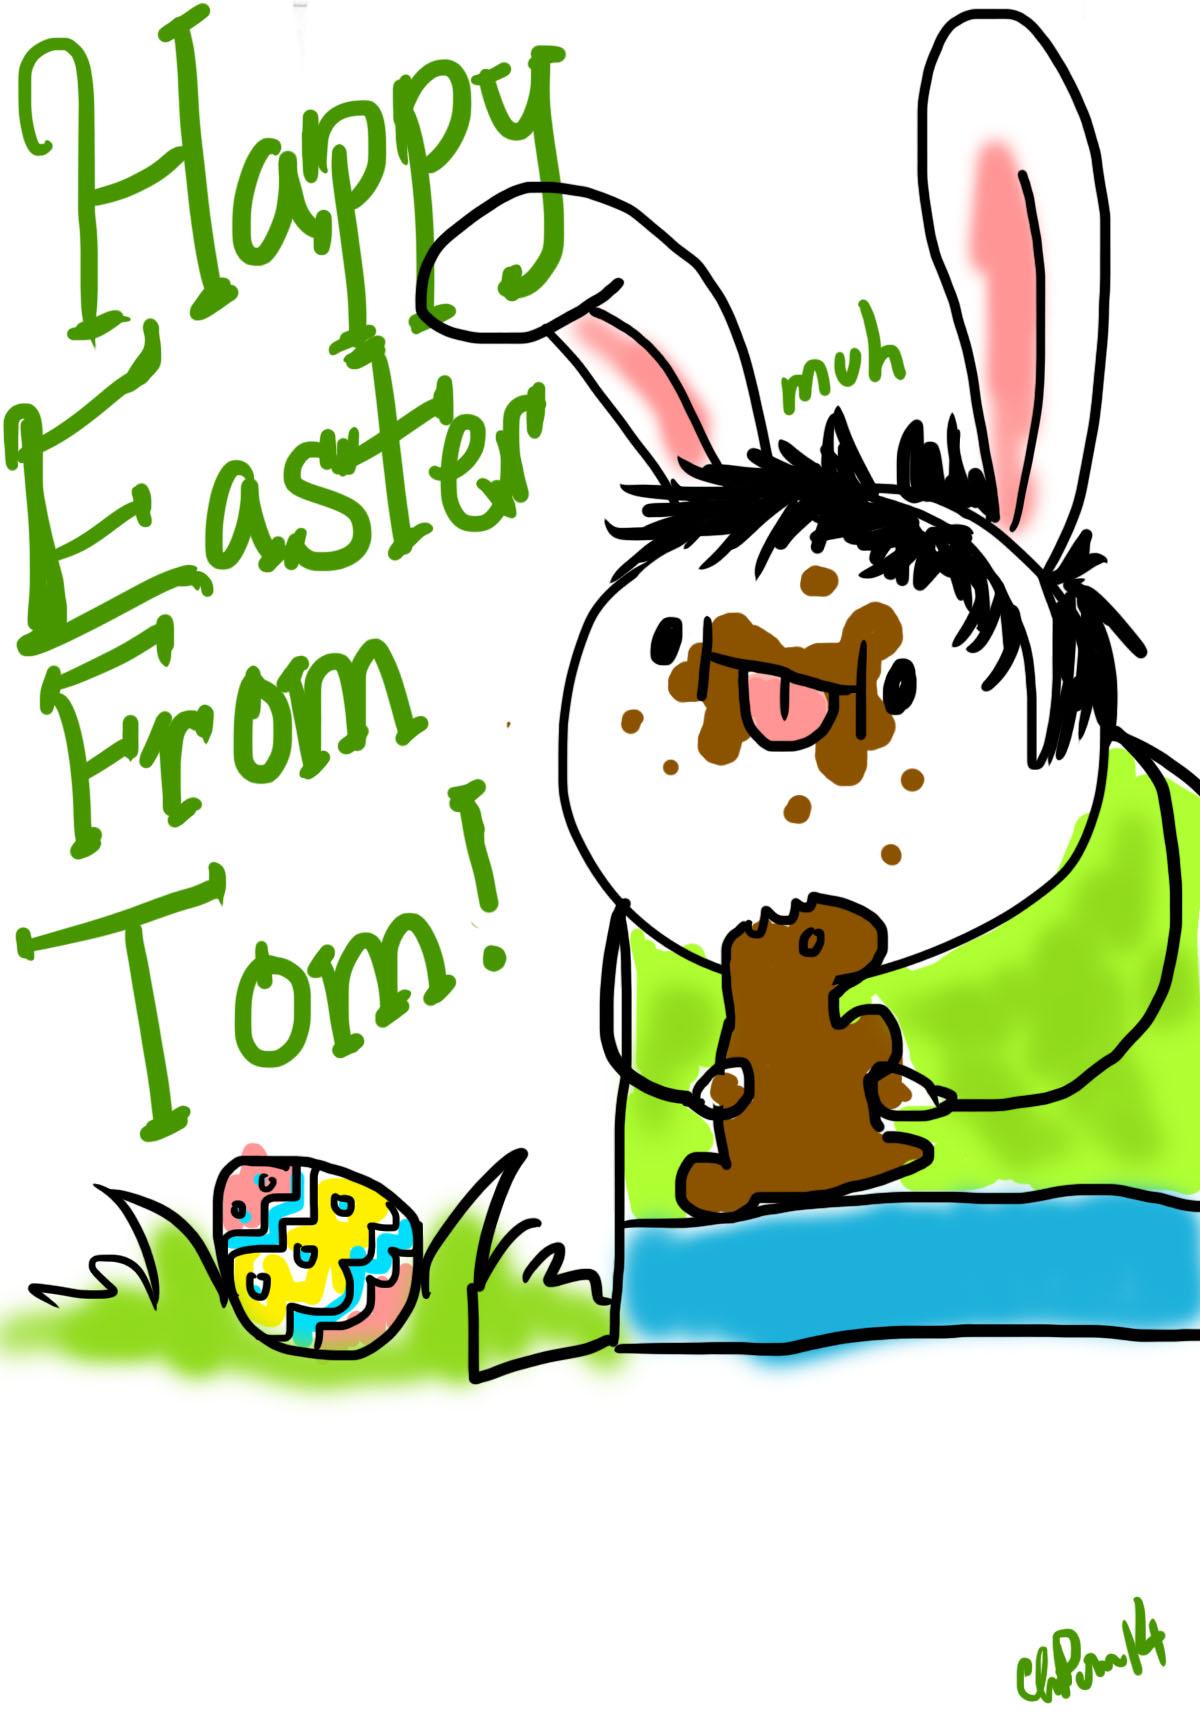 Happy Easter! Muh.